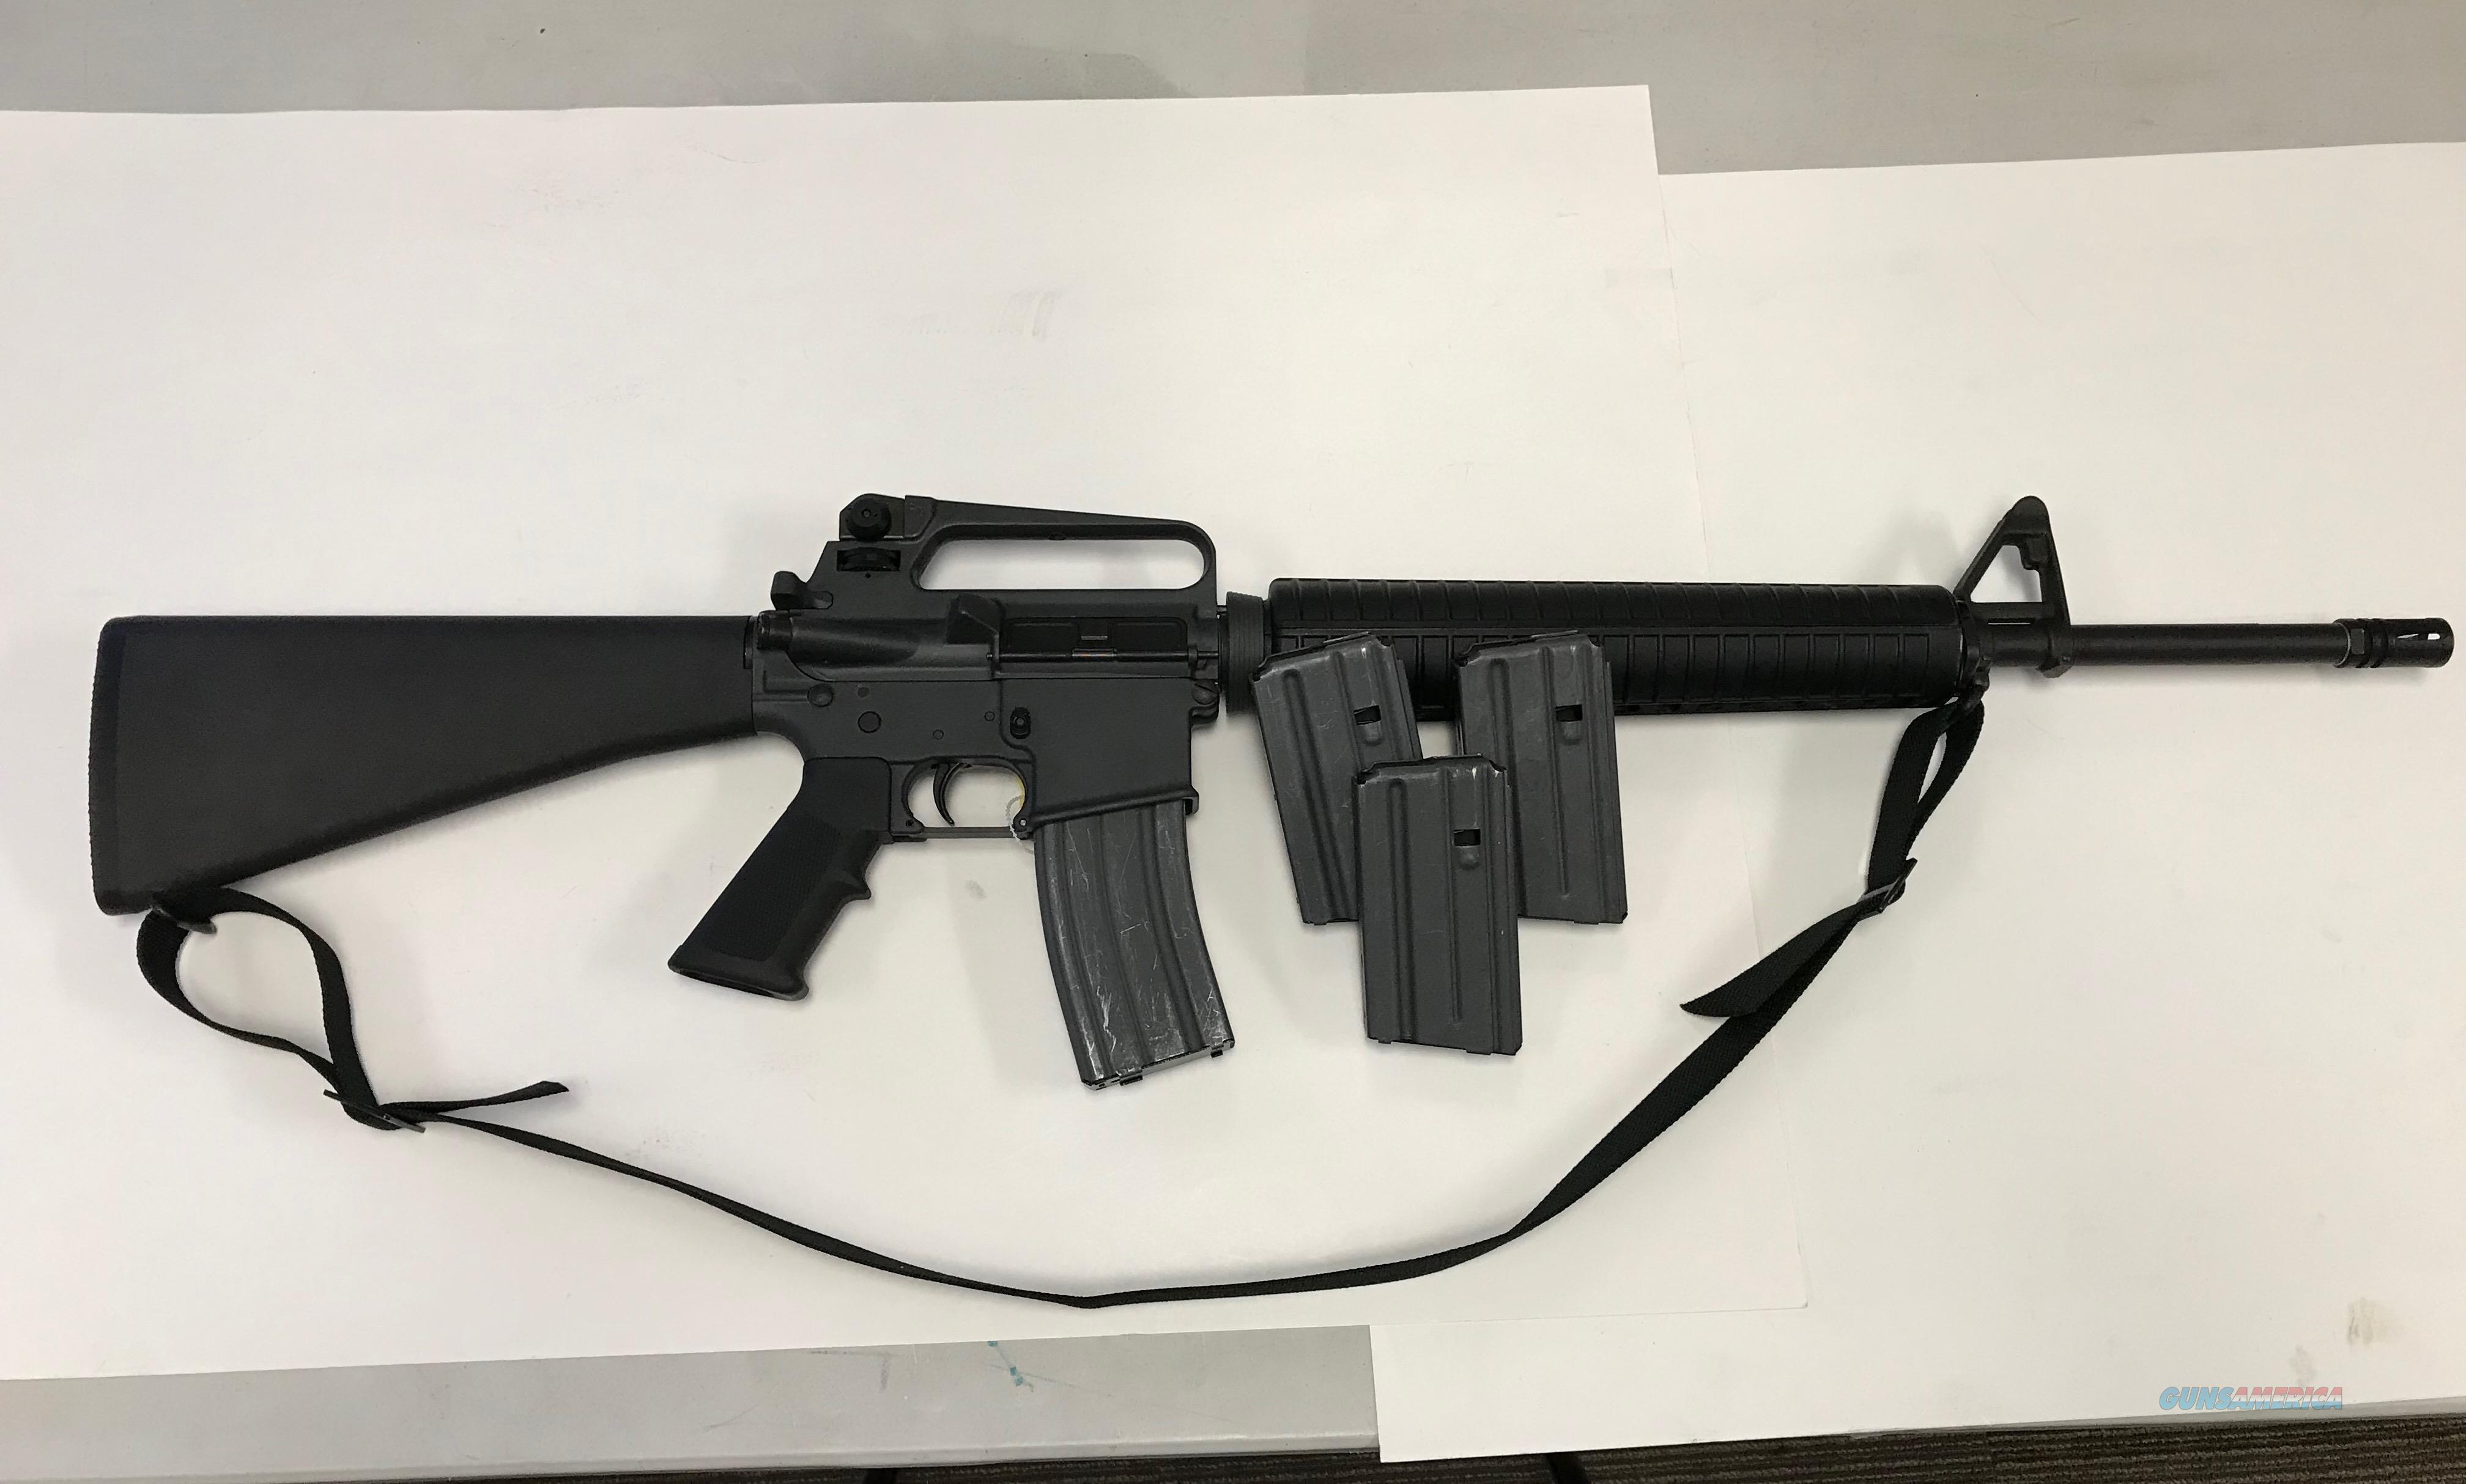 USED PRE-BAN Colt Sporter Match HBar  Guns > Rifles > Colt Military/Tactical Rifles